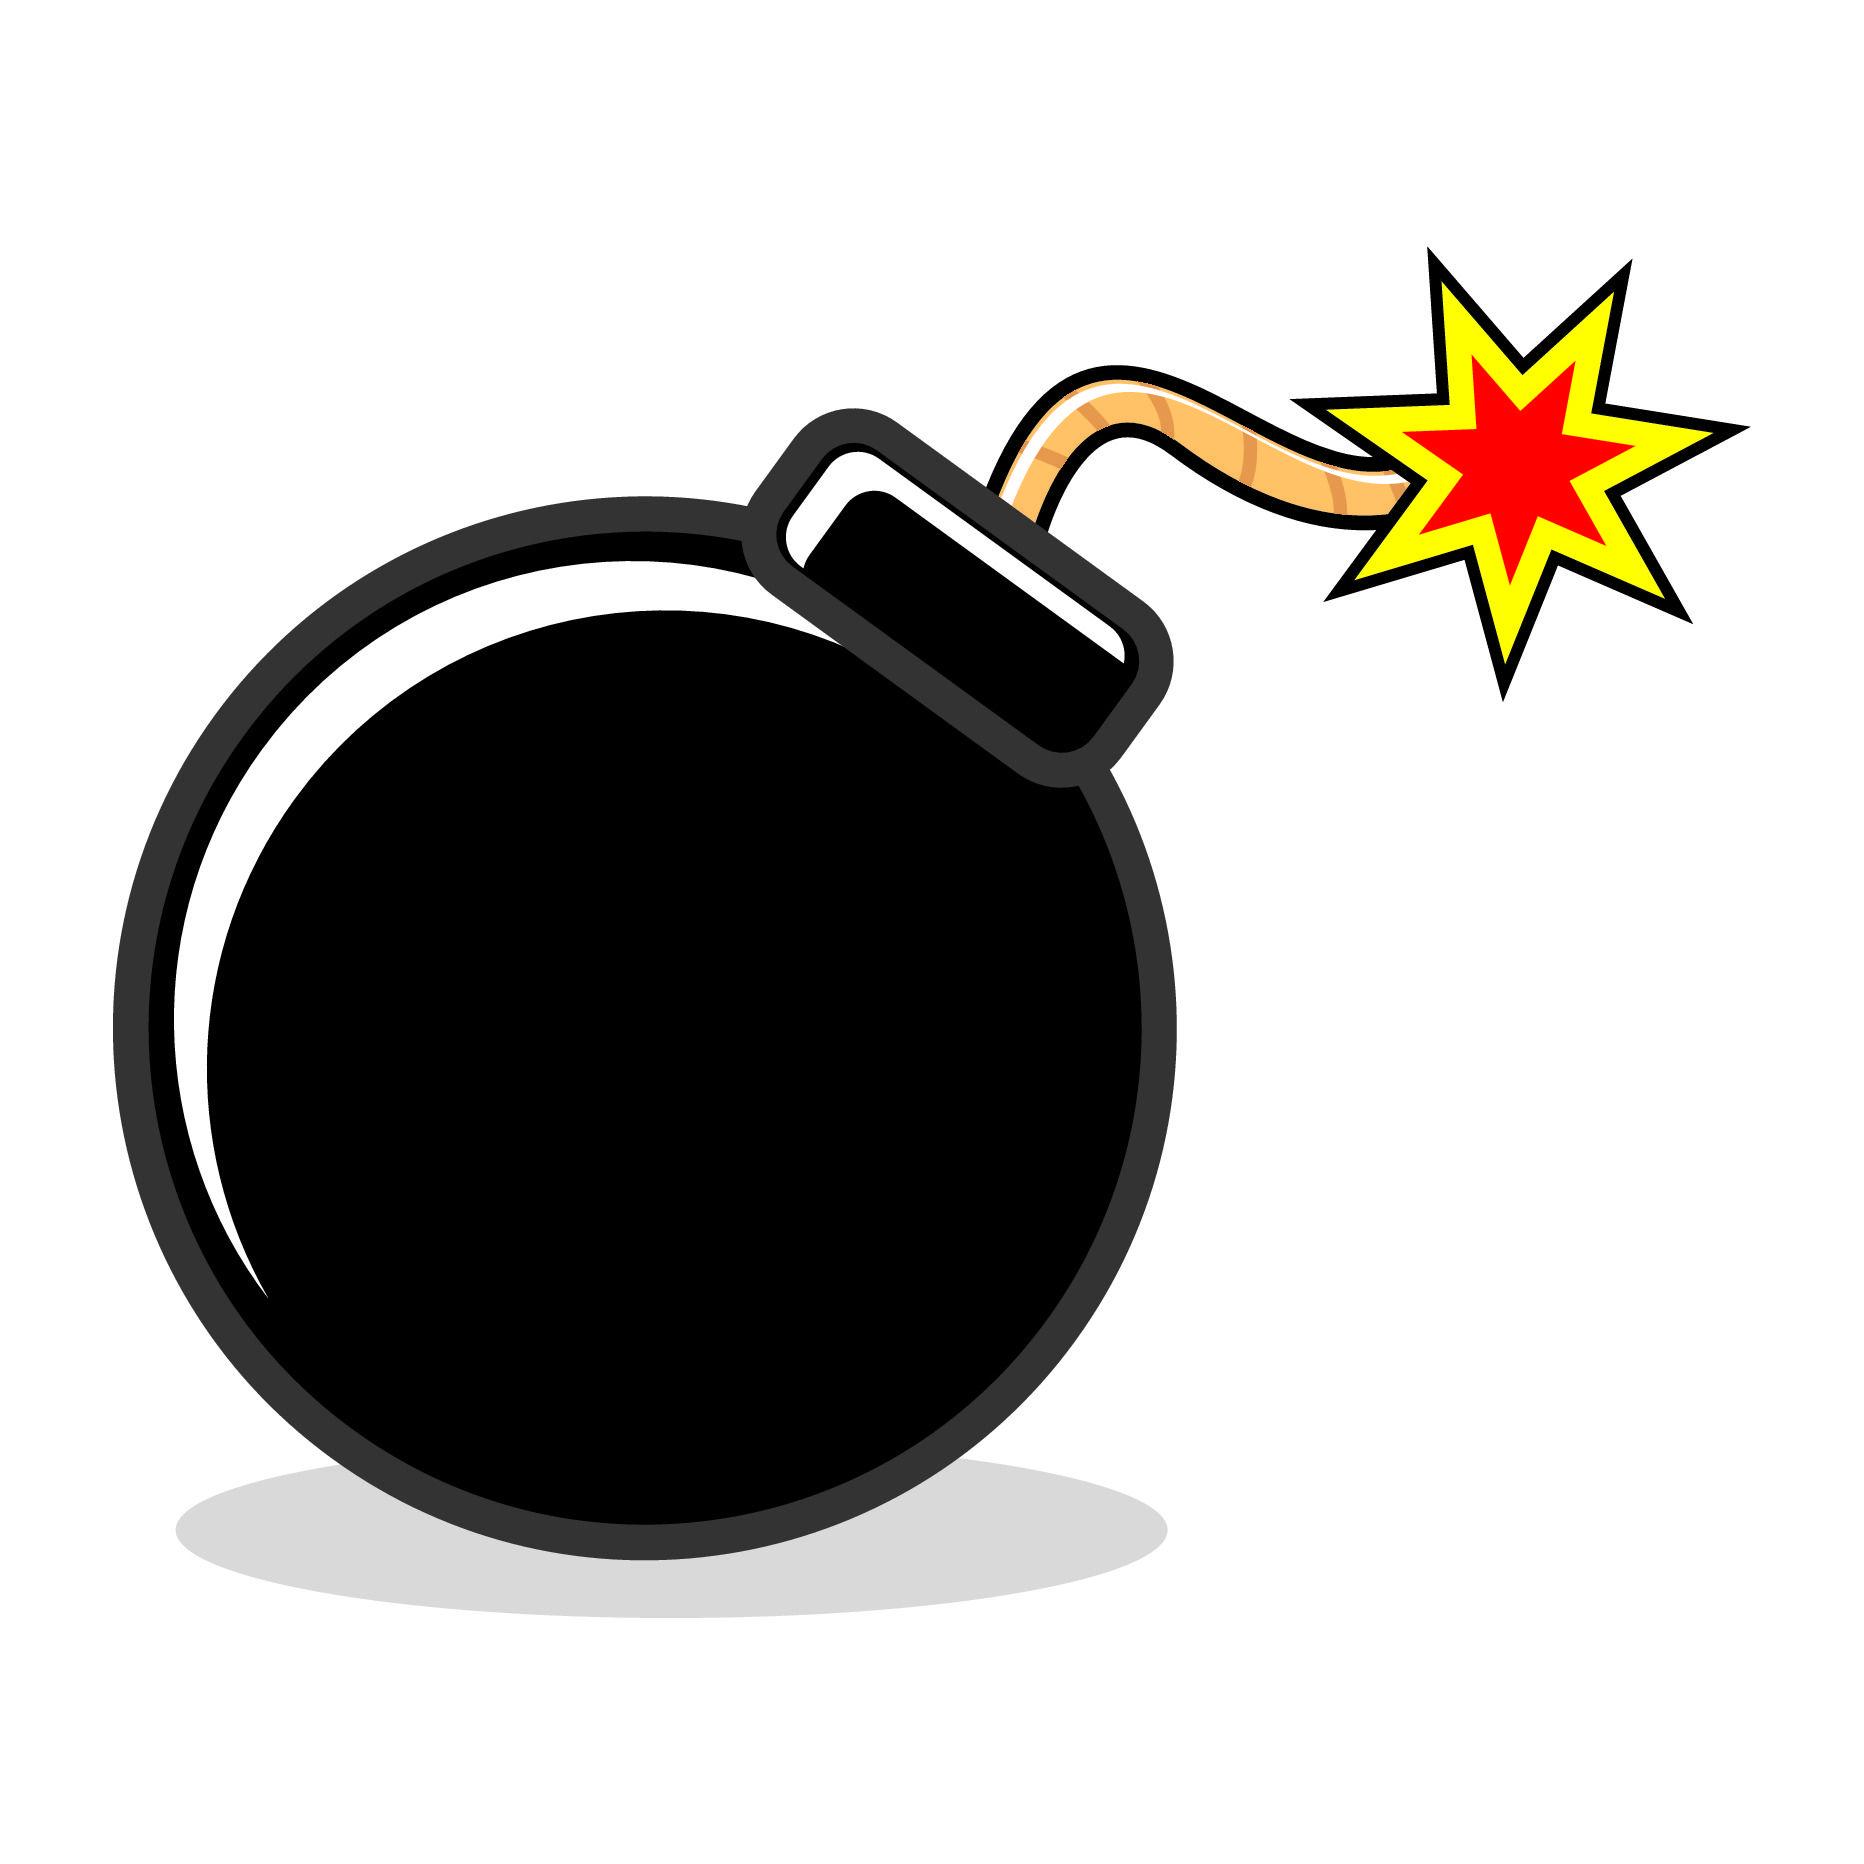 Bomb clipart comic, Picture #111031 bomb clipart comic.